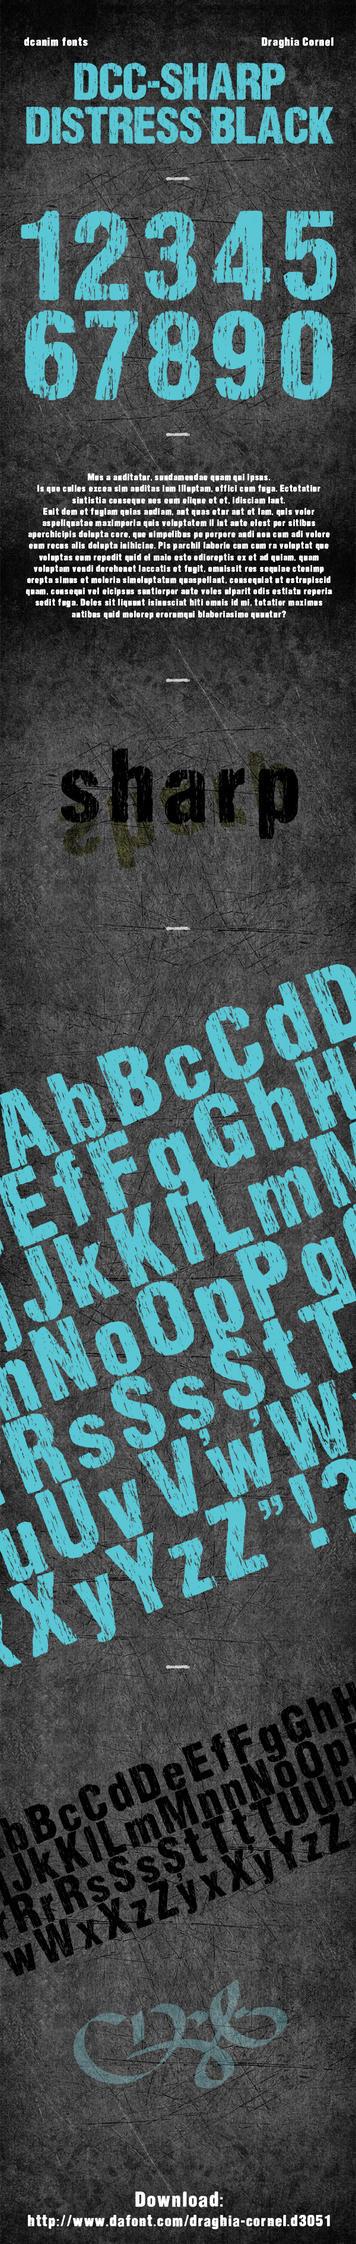 DCC-Sharp Distress Black - font by dccanim